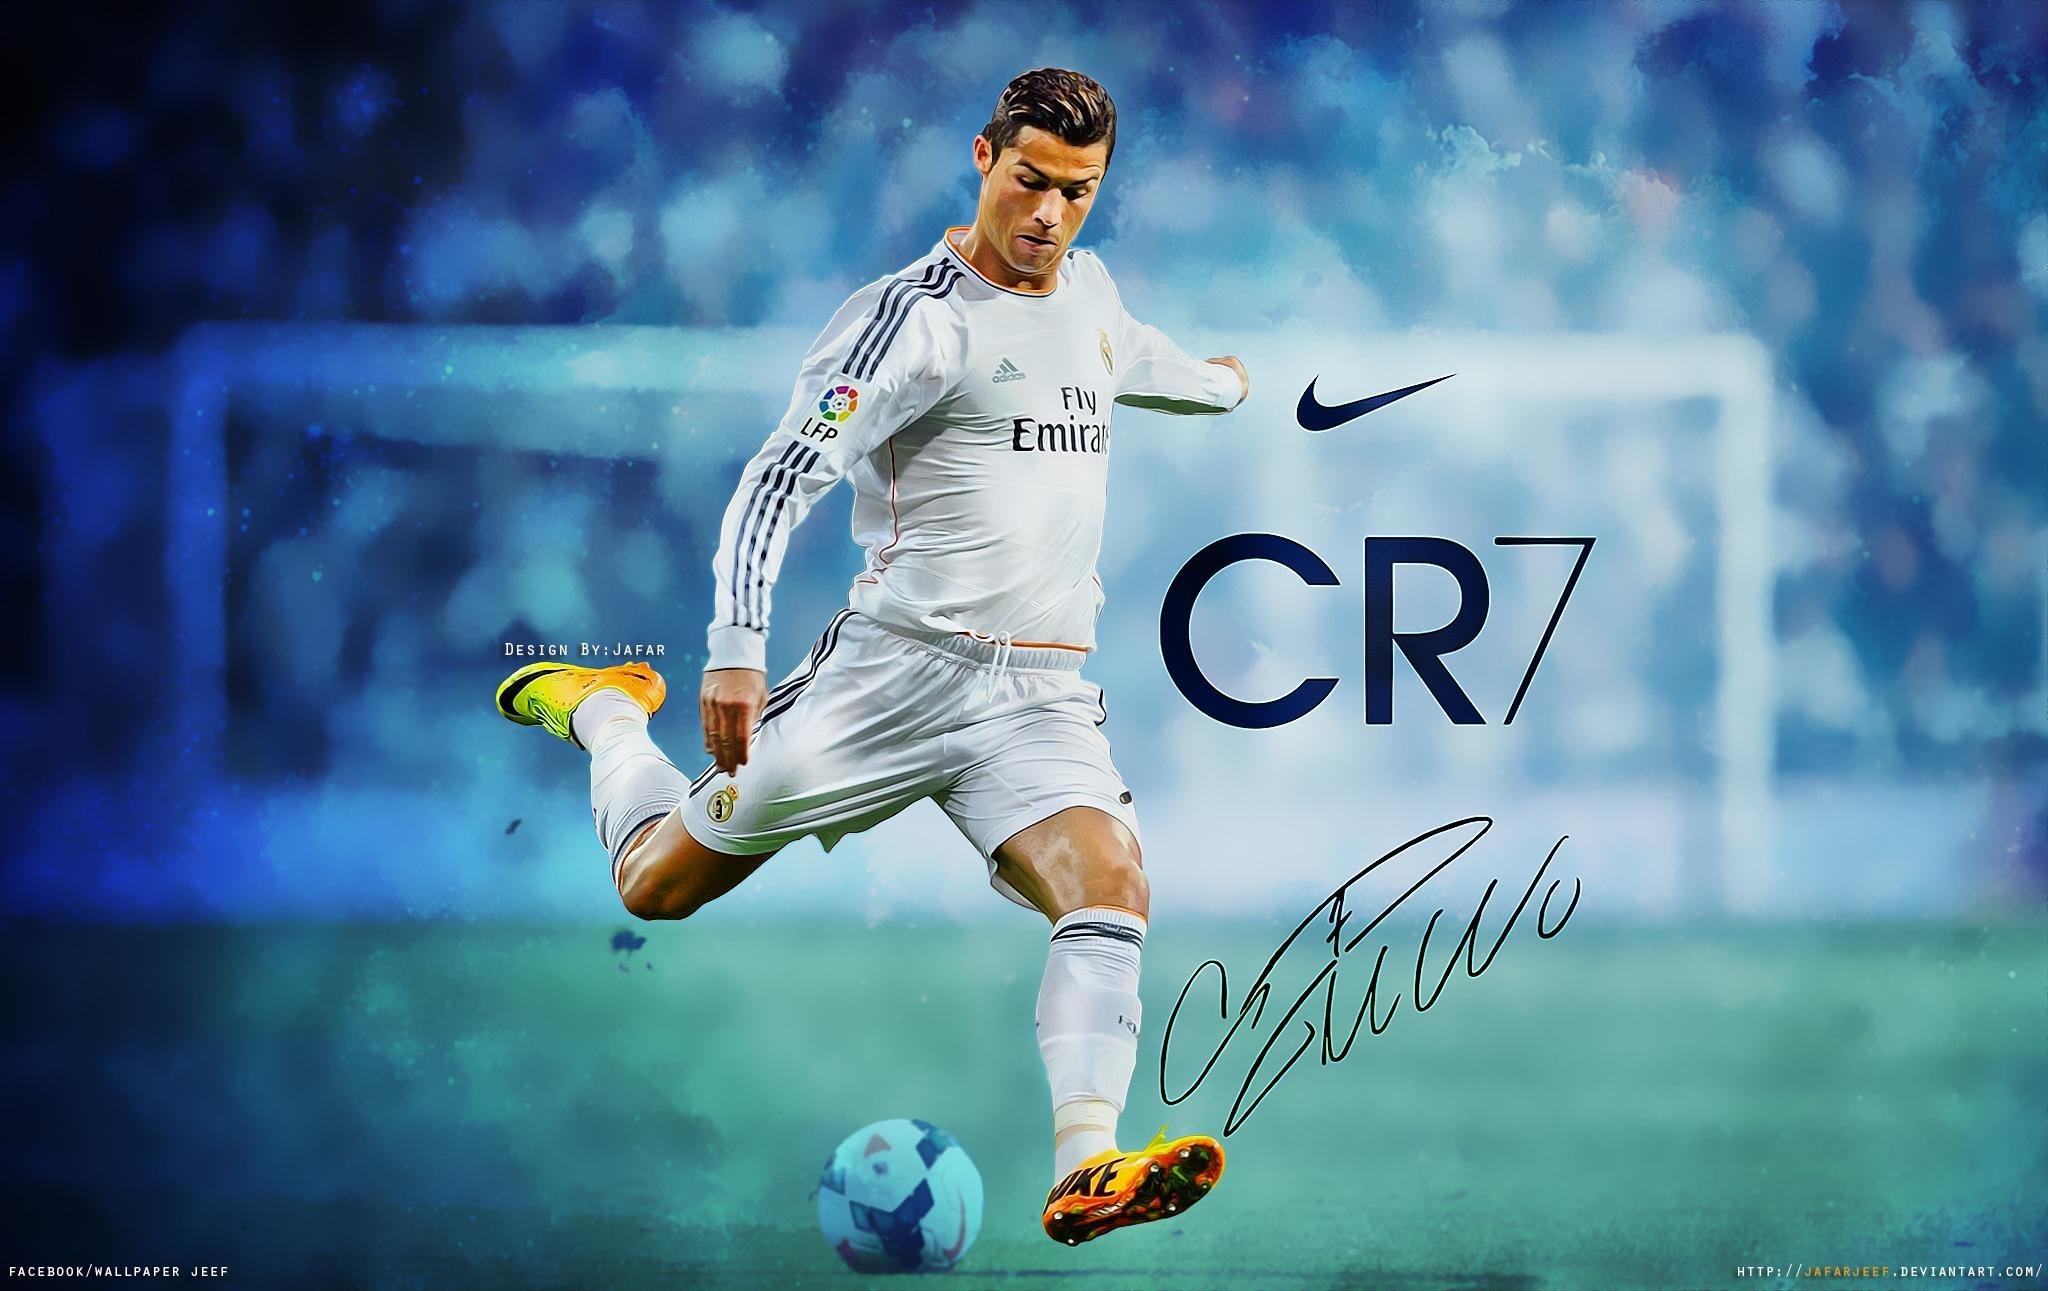 cristiano ronaldo 2015 wallpapers hd - maillot de foot pas cher